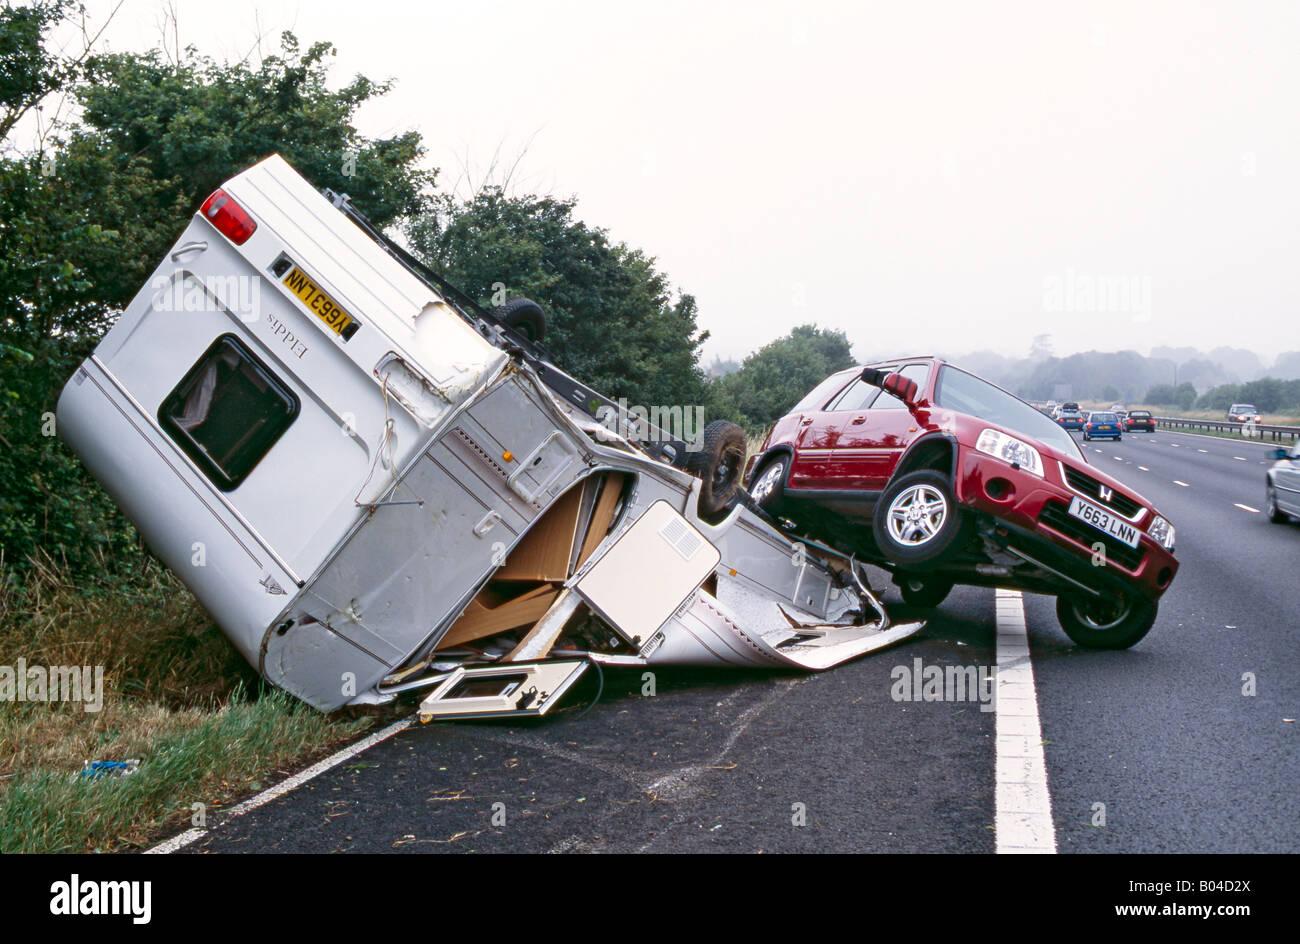 nasty caravan crash on a british motorway - Stock Image